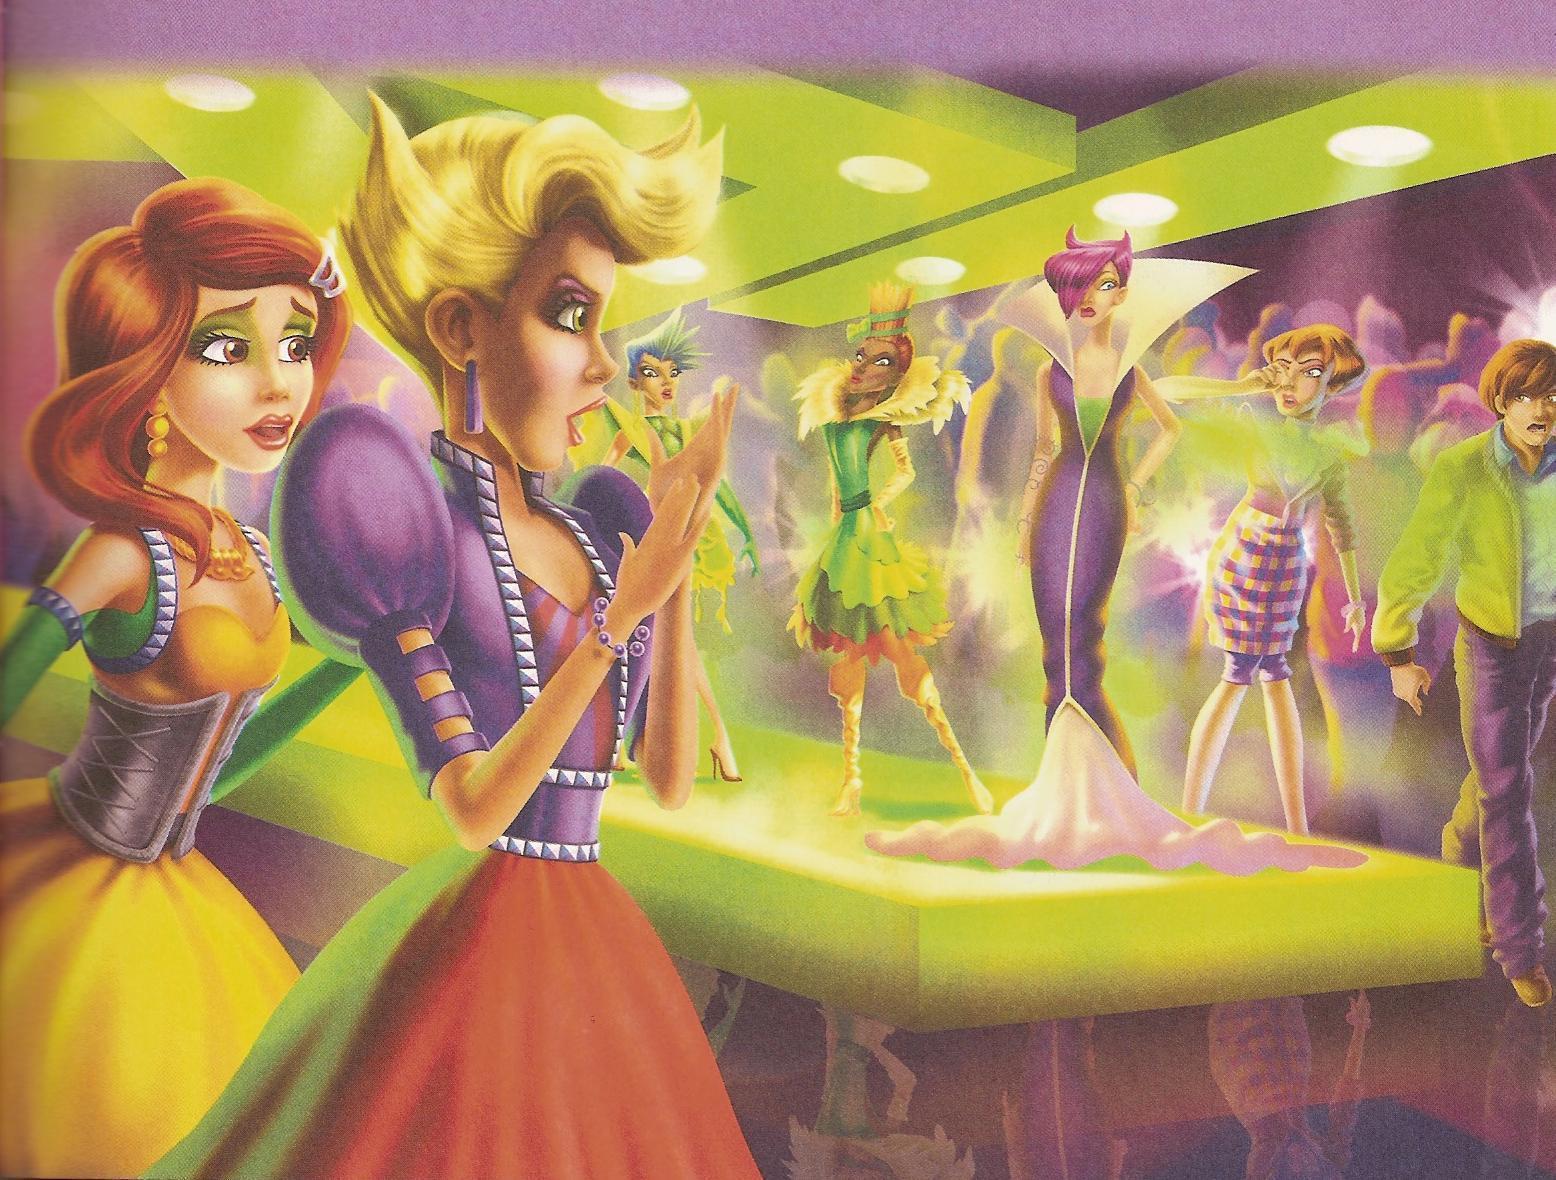 New barbie fashion fairytale games 51